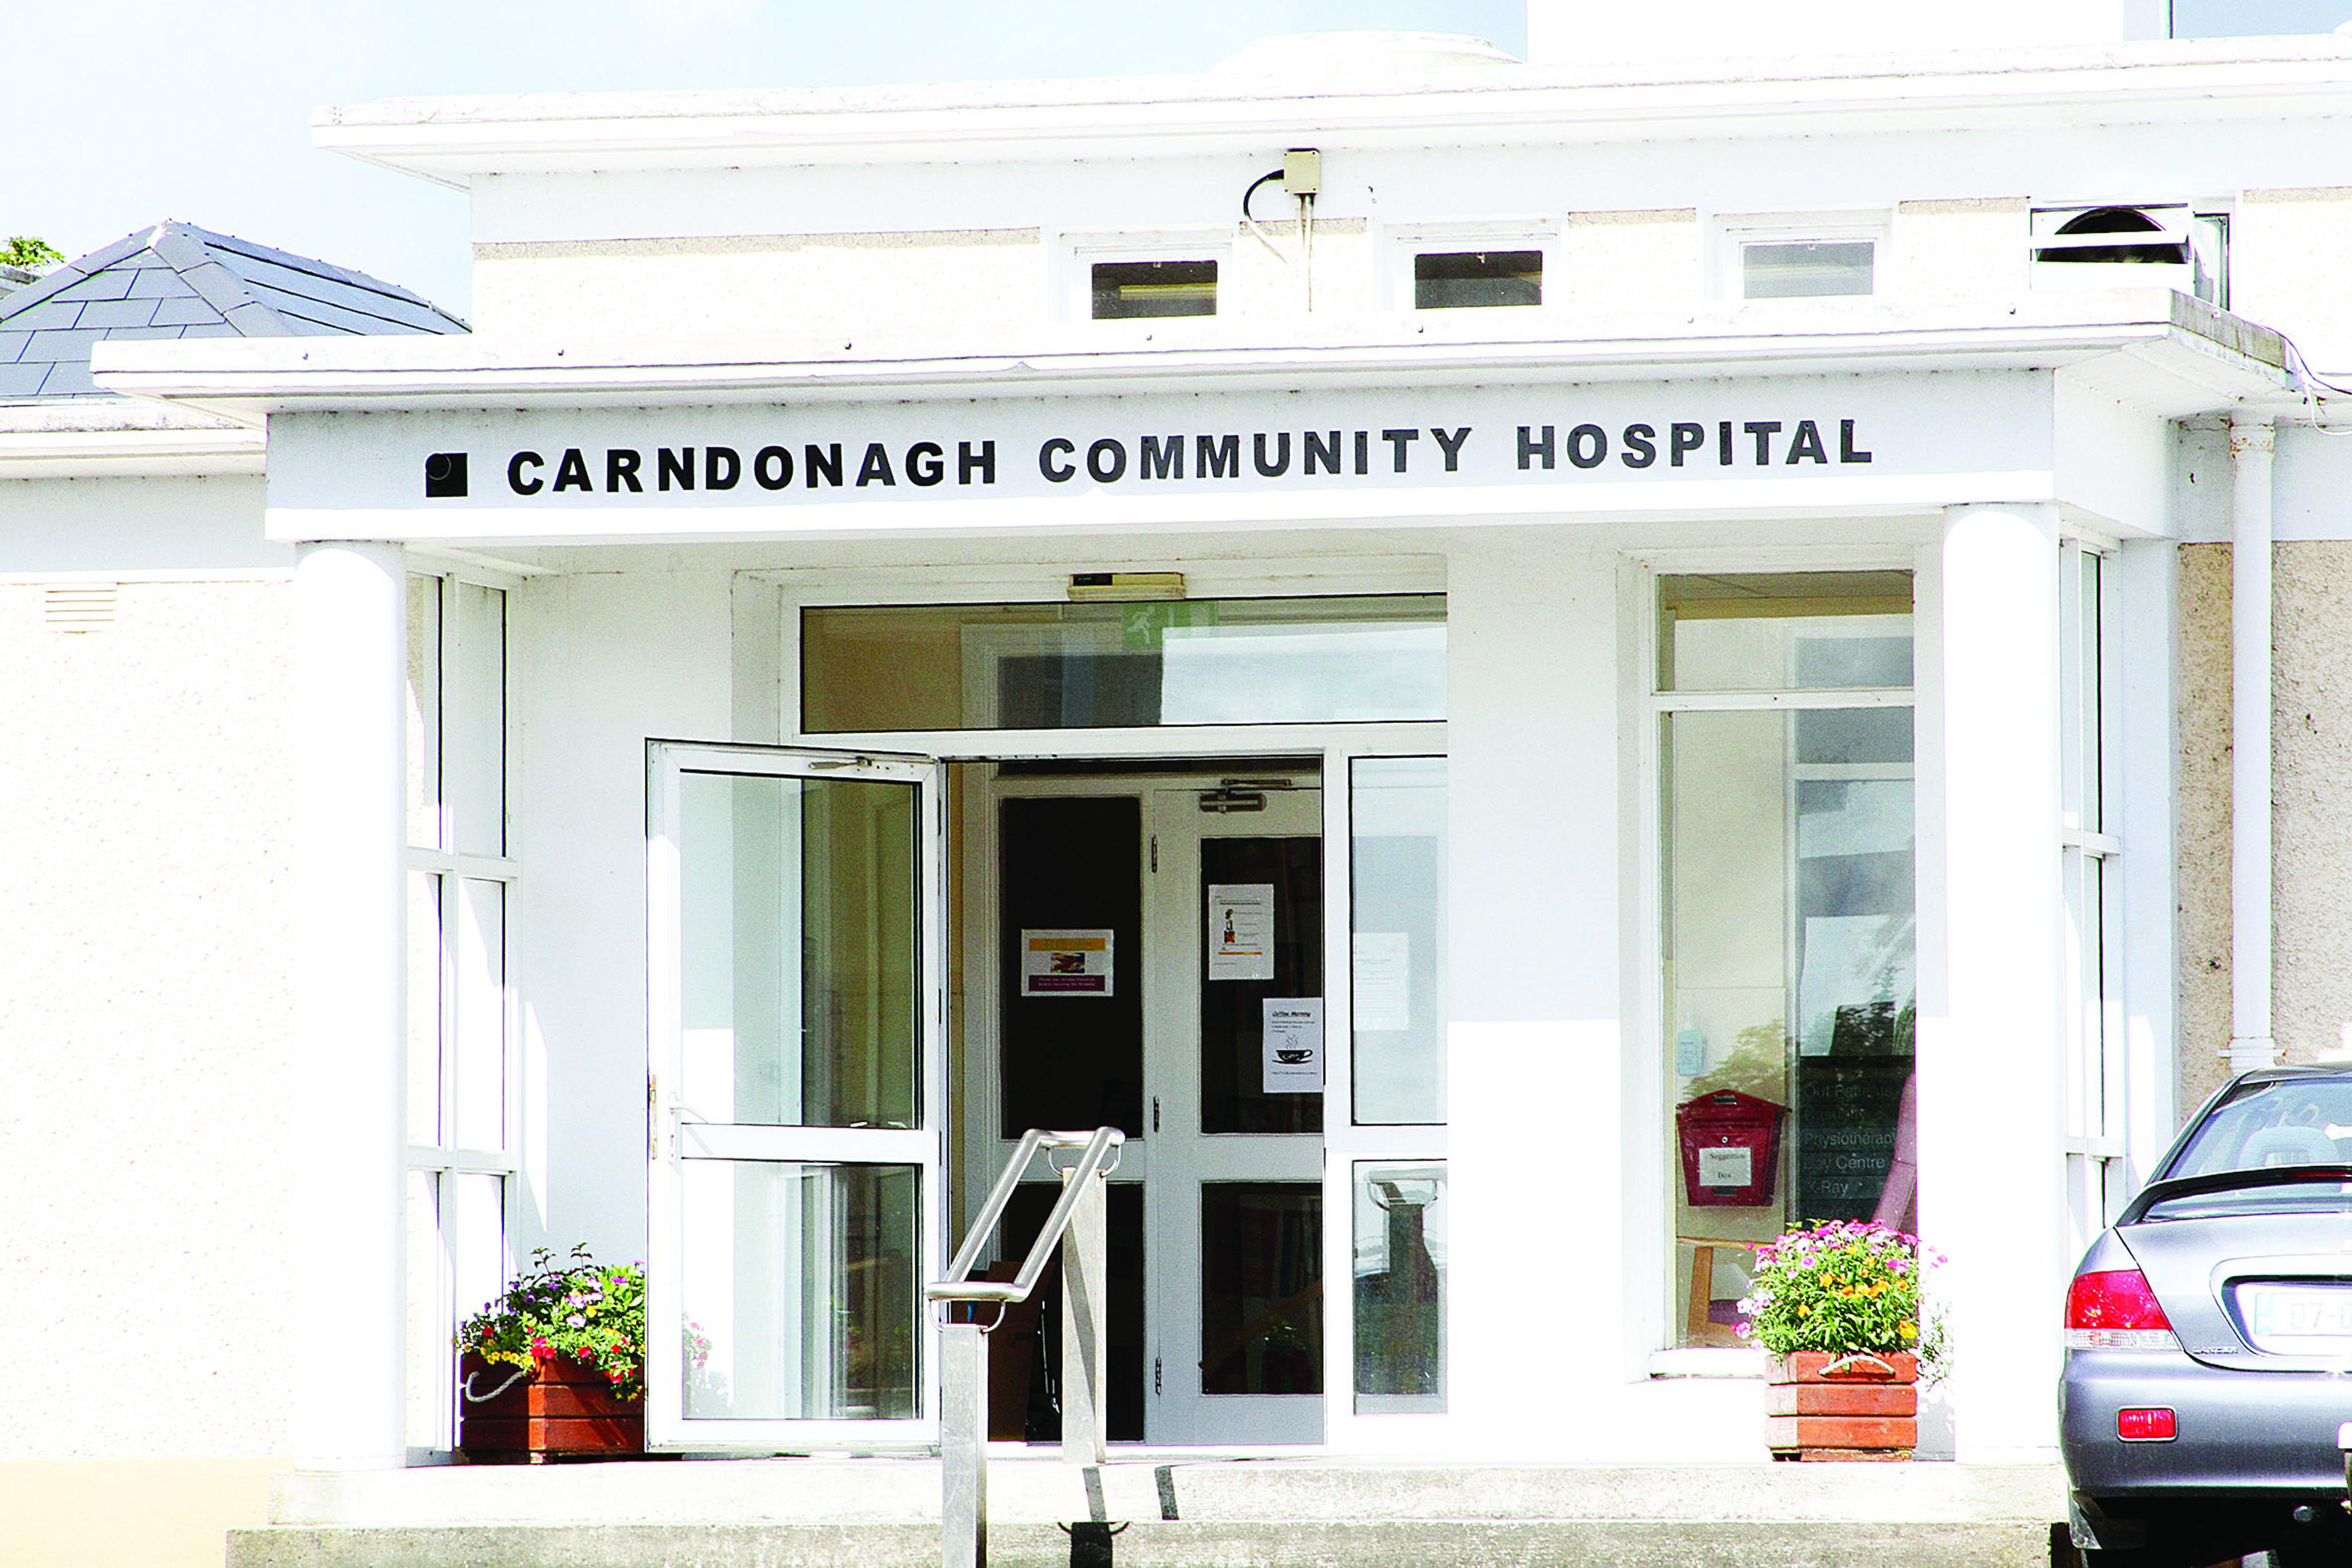 Carndonagh Community Hospital